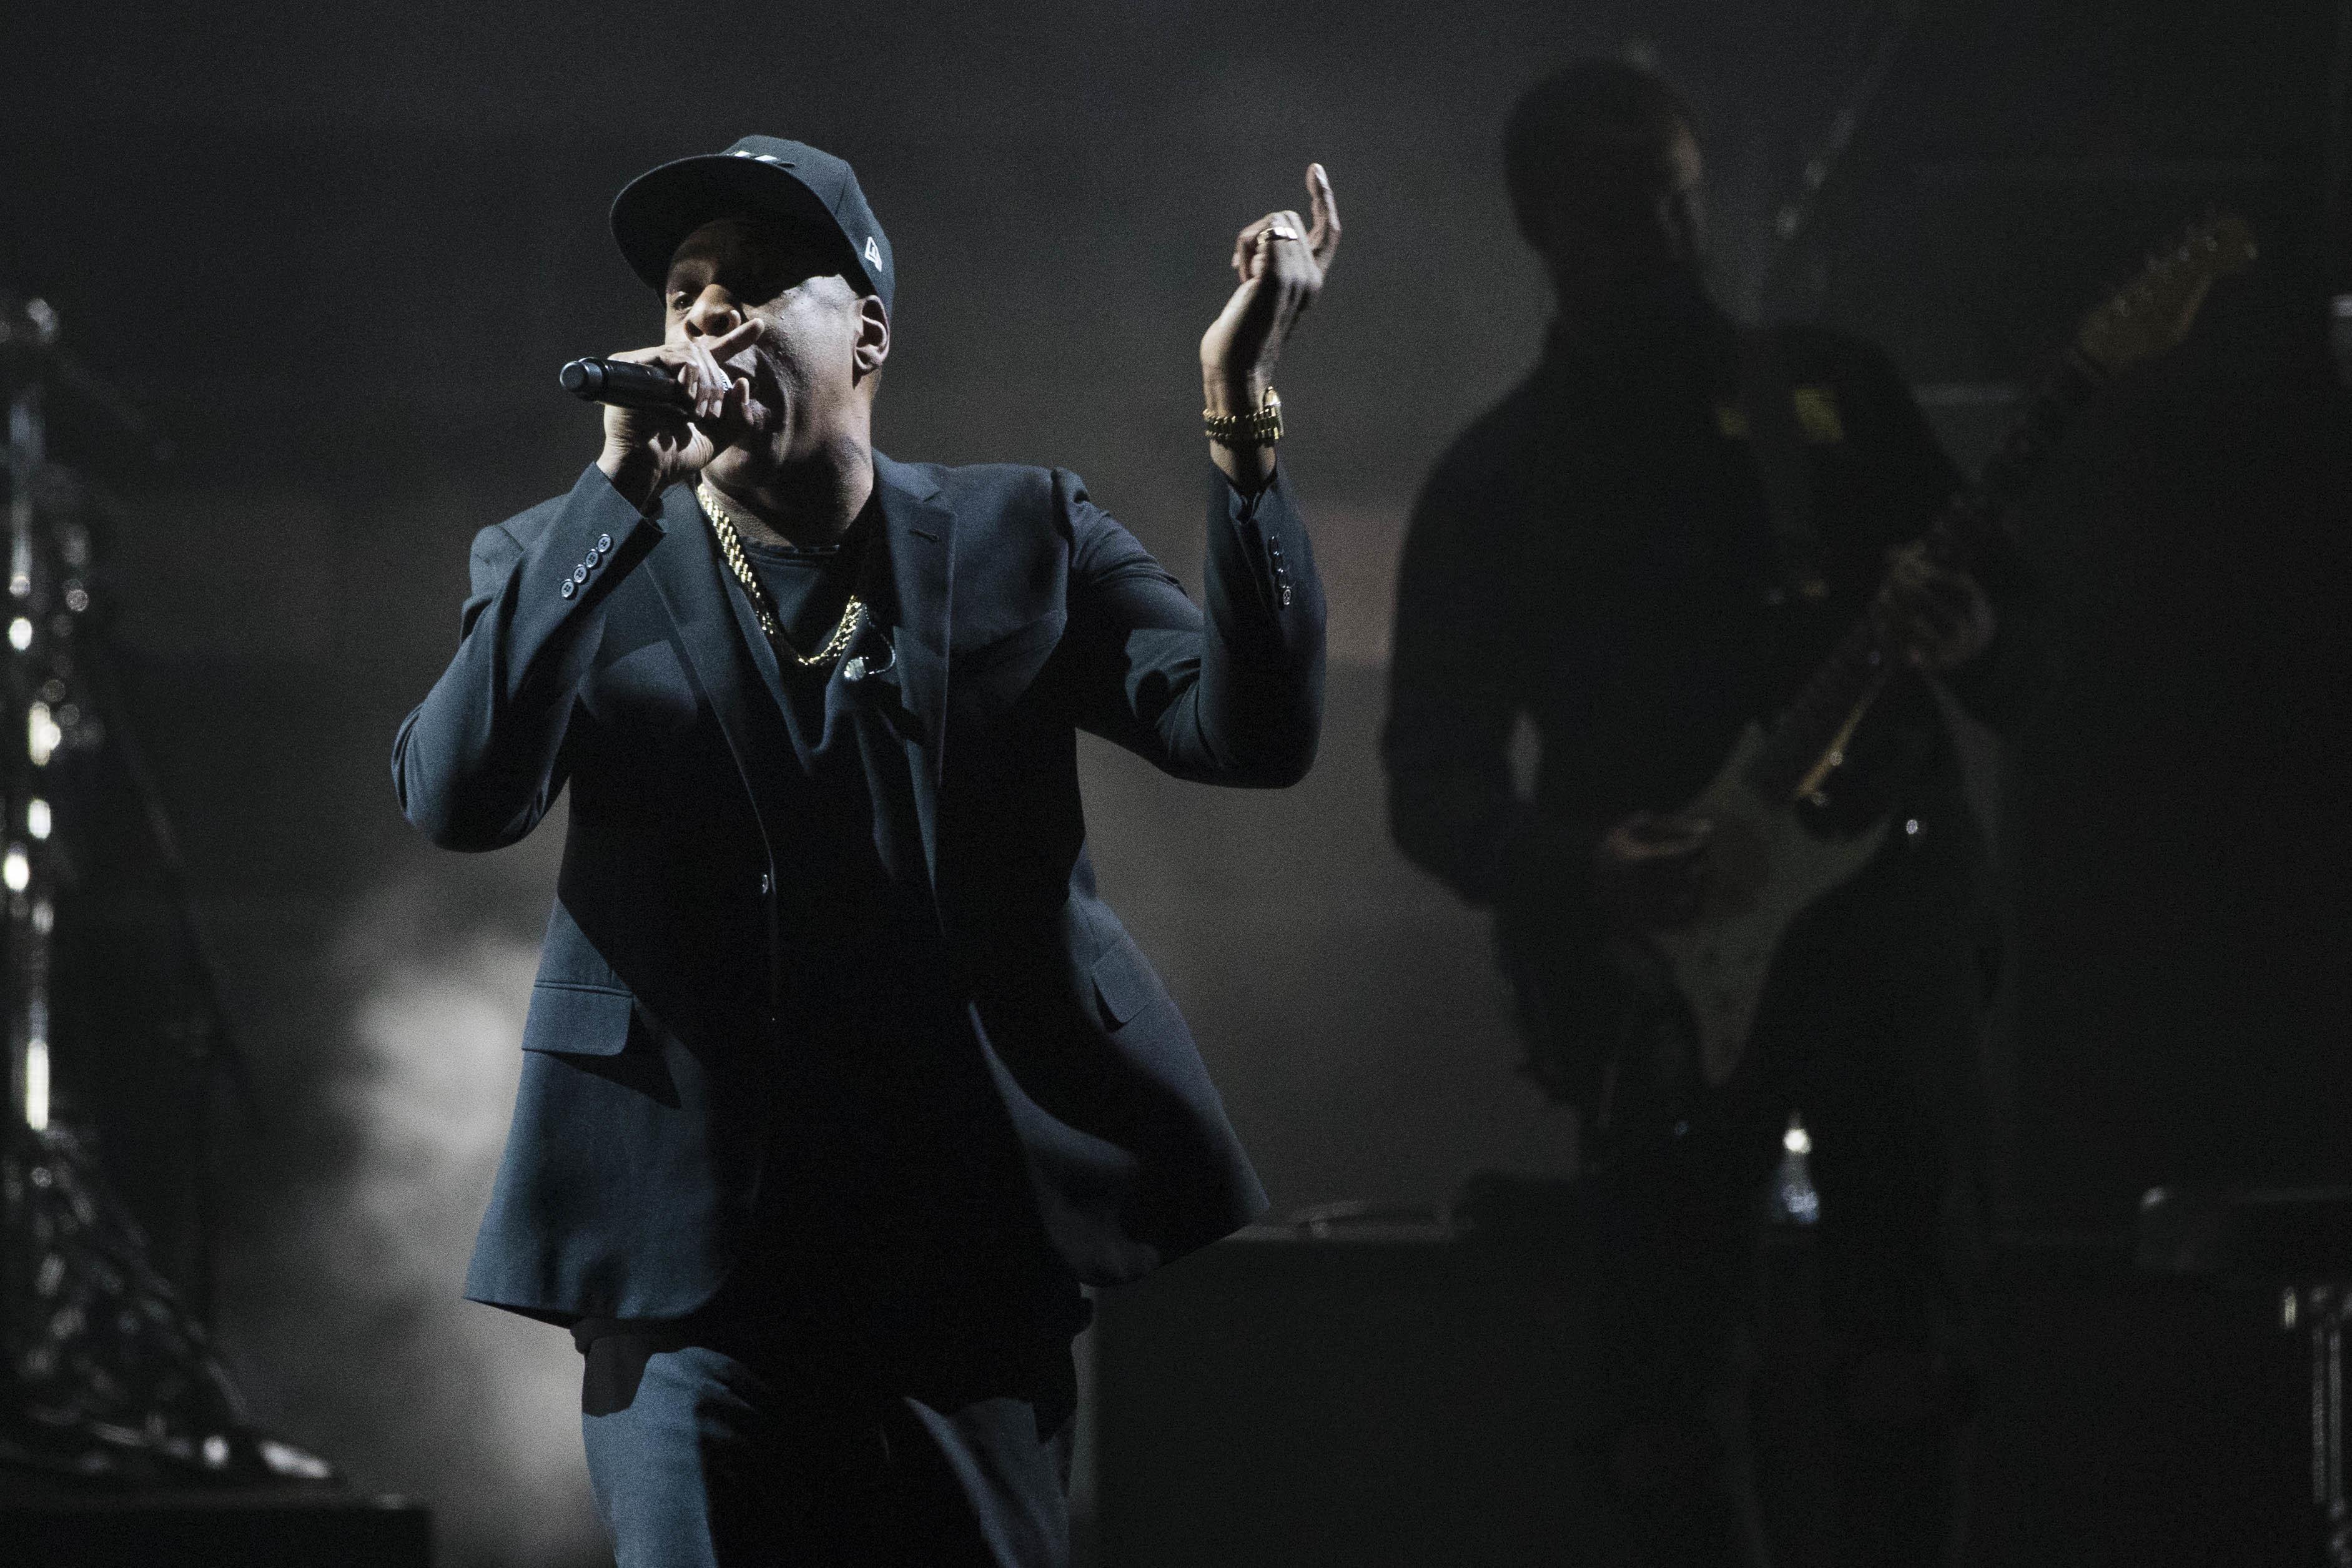 Lyor Cohen says hip-hop should dominate at upcoming Grammys